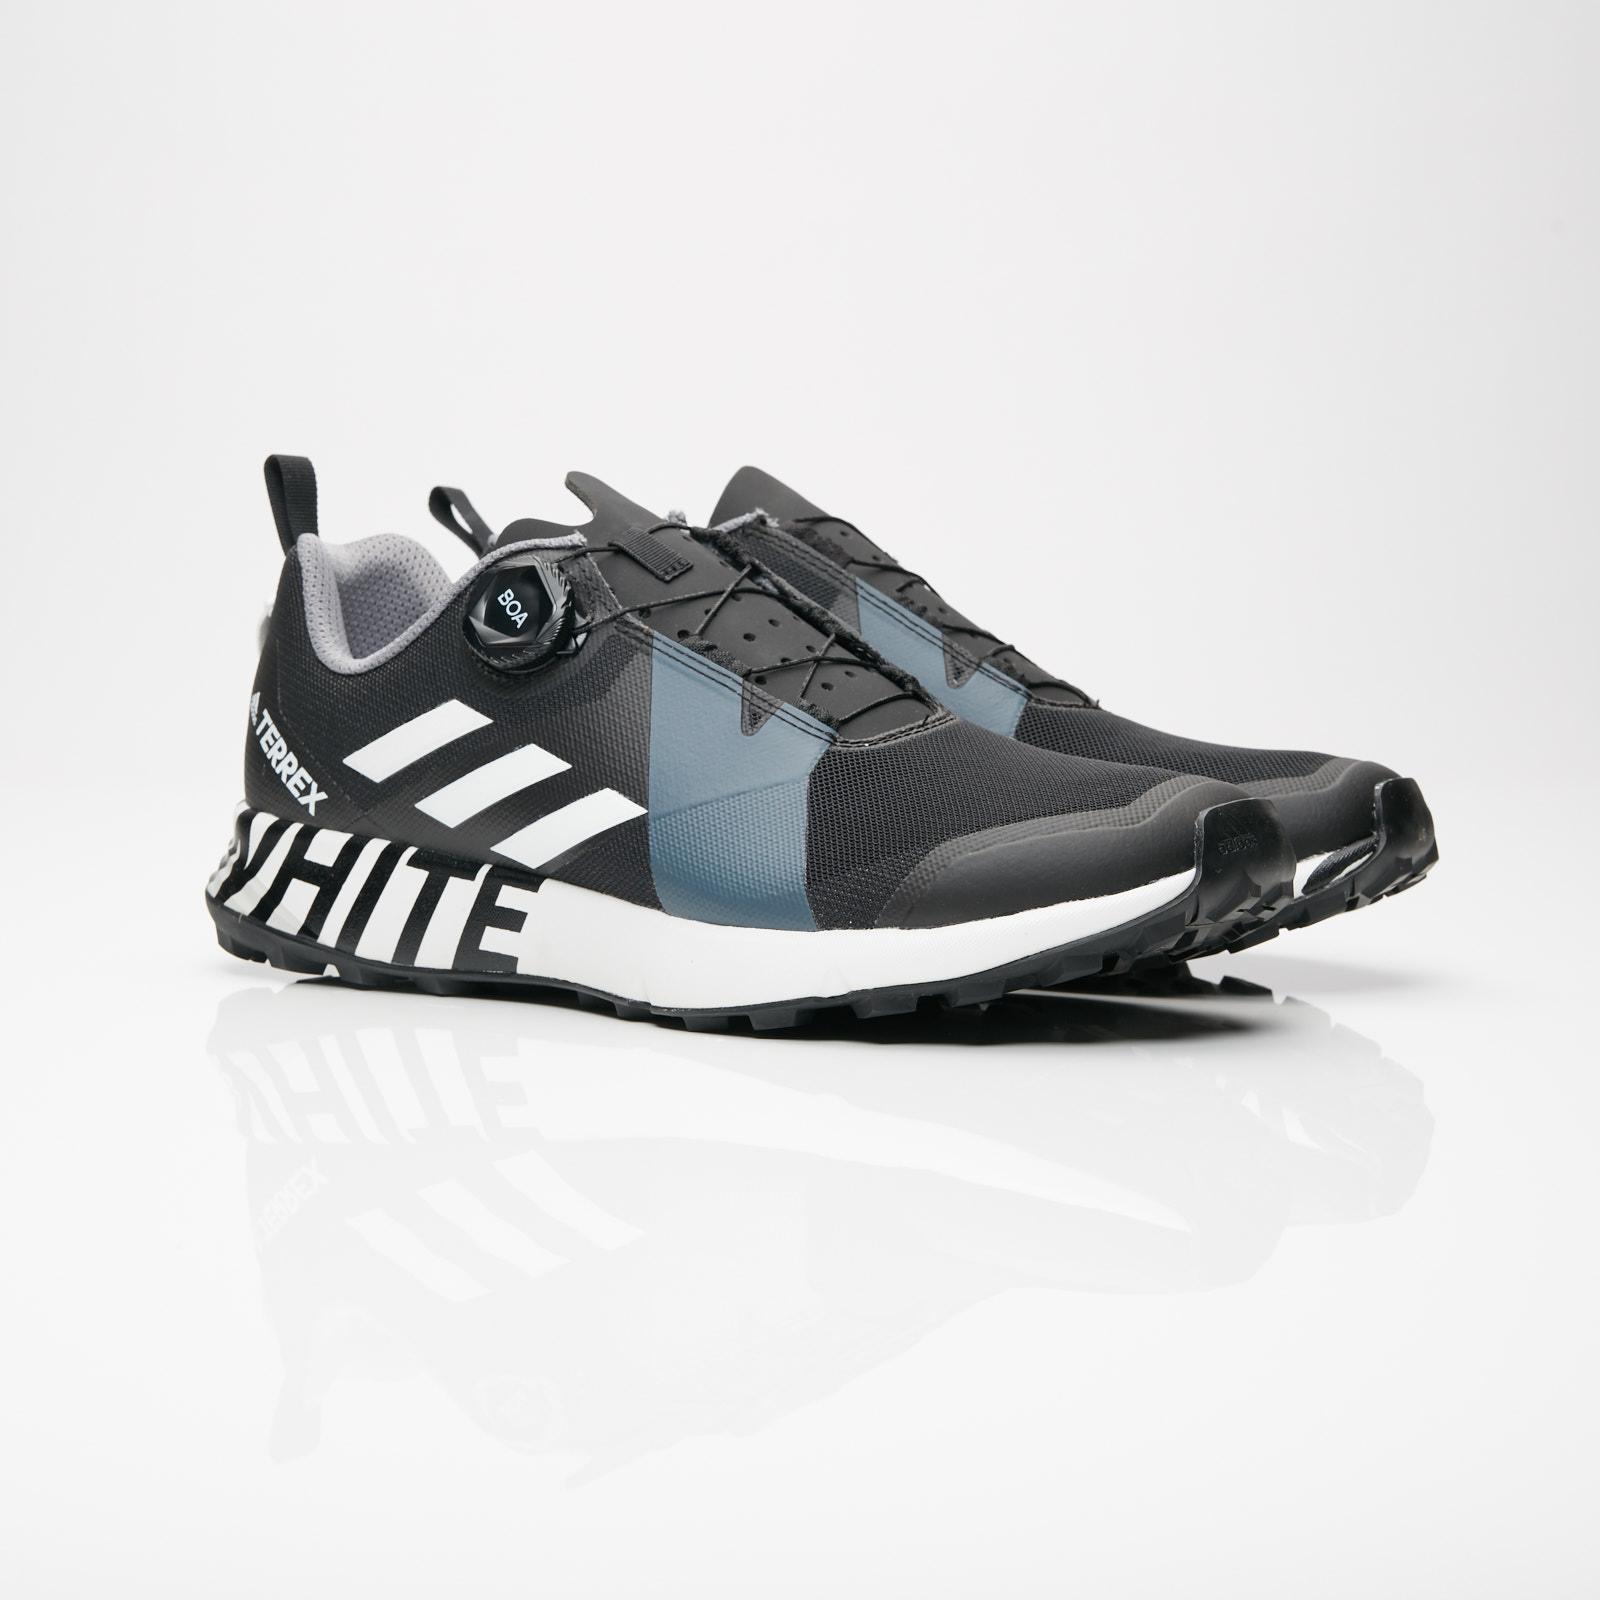 3f7abb33ea56 adidas WM Terrex TWO BOA - Bb7743 - Sneakersnstuff